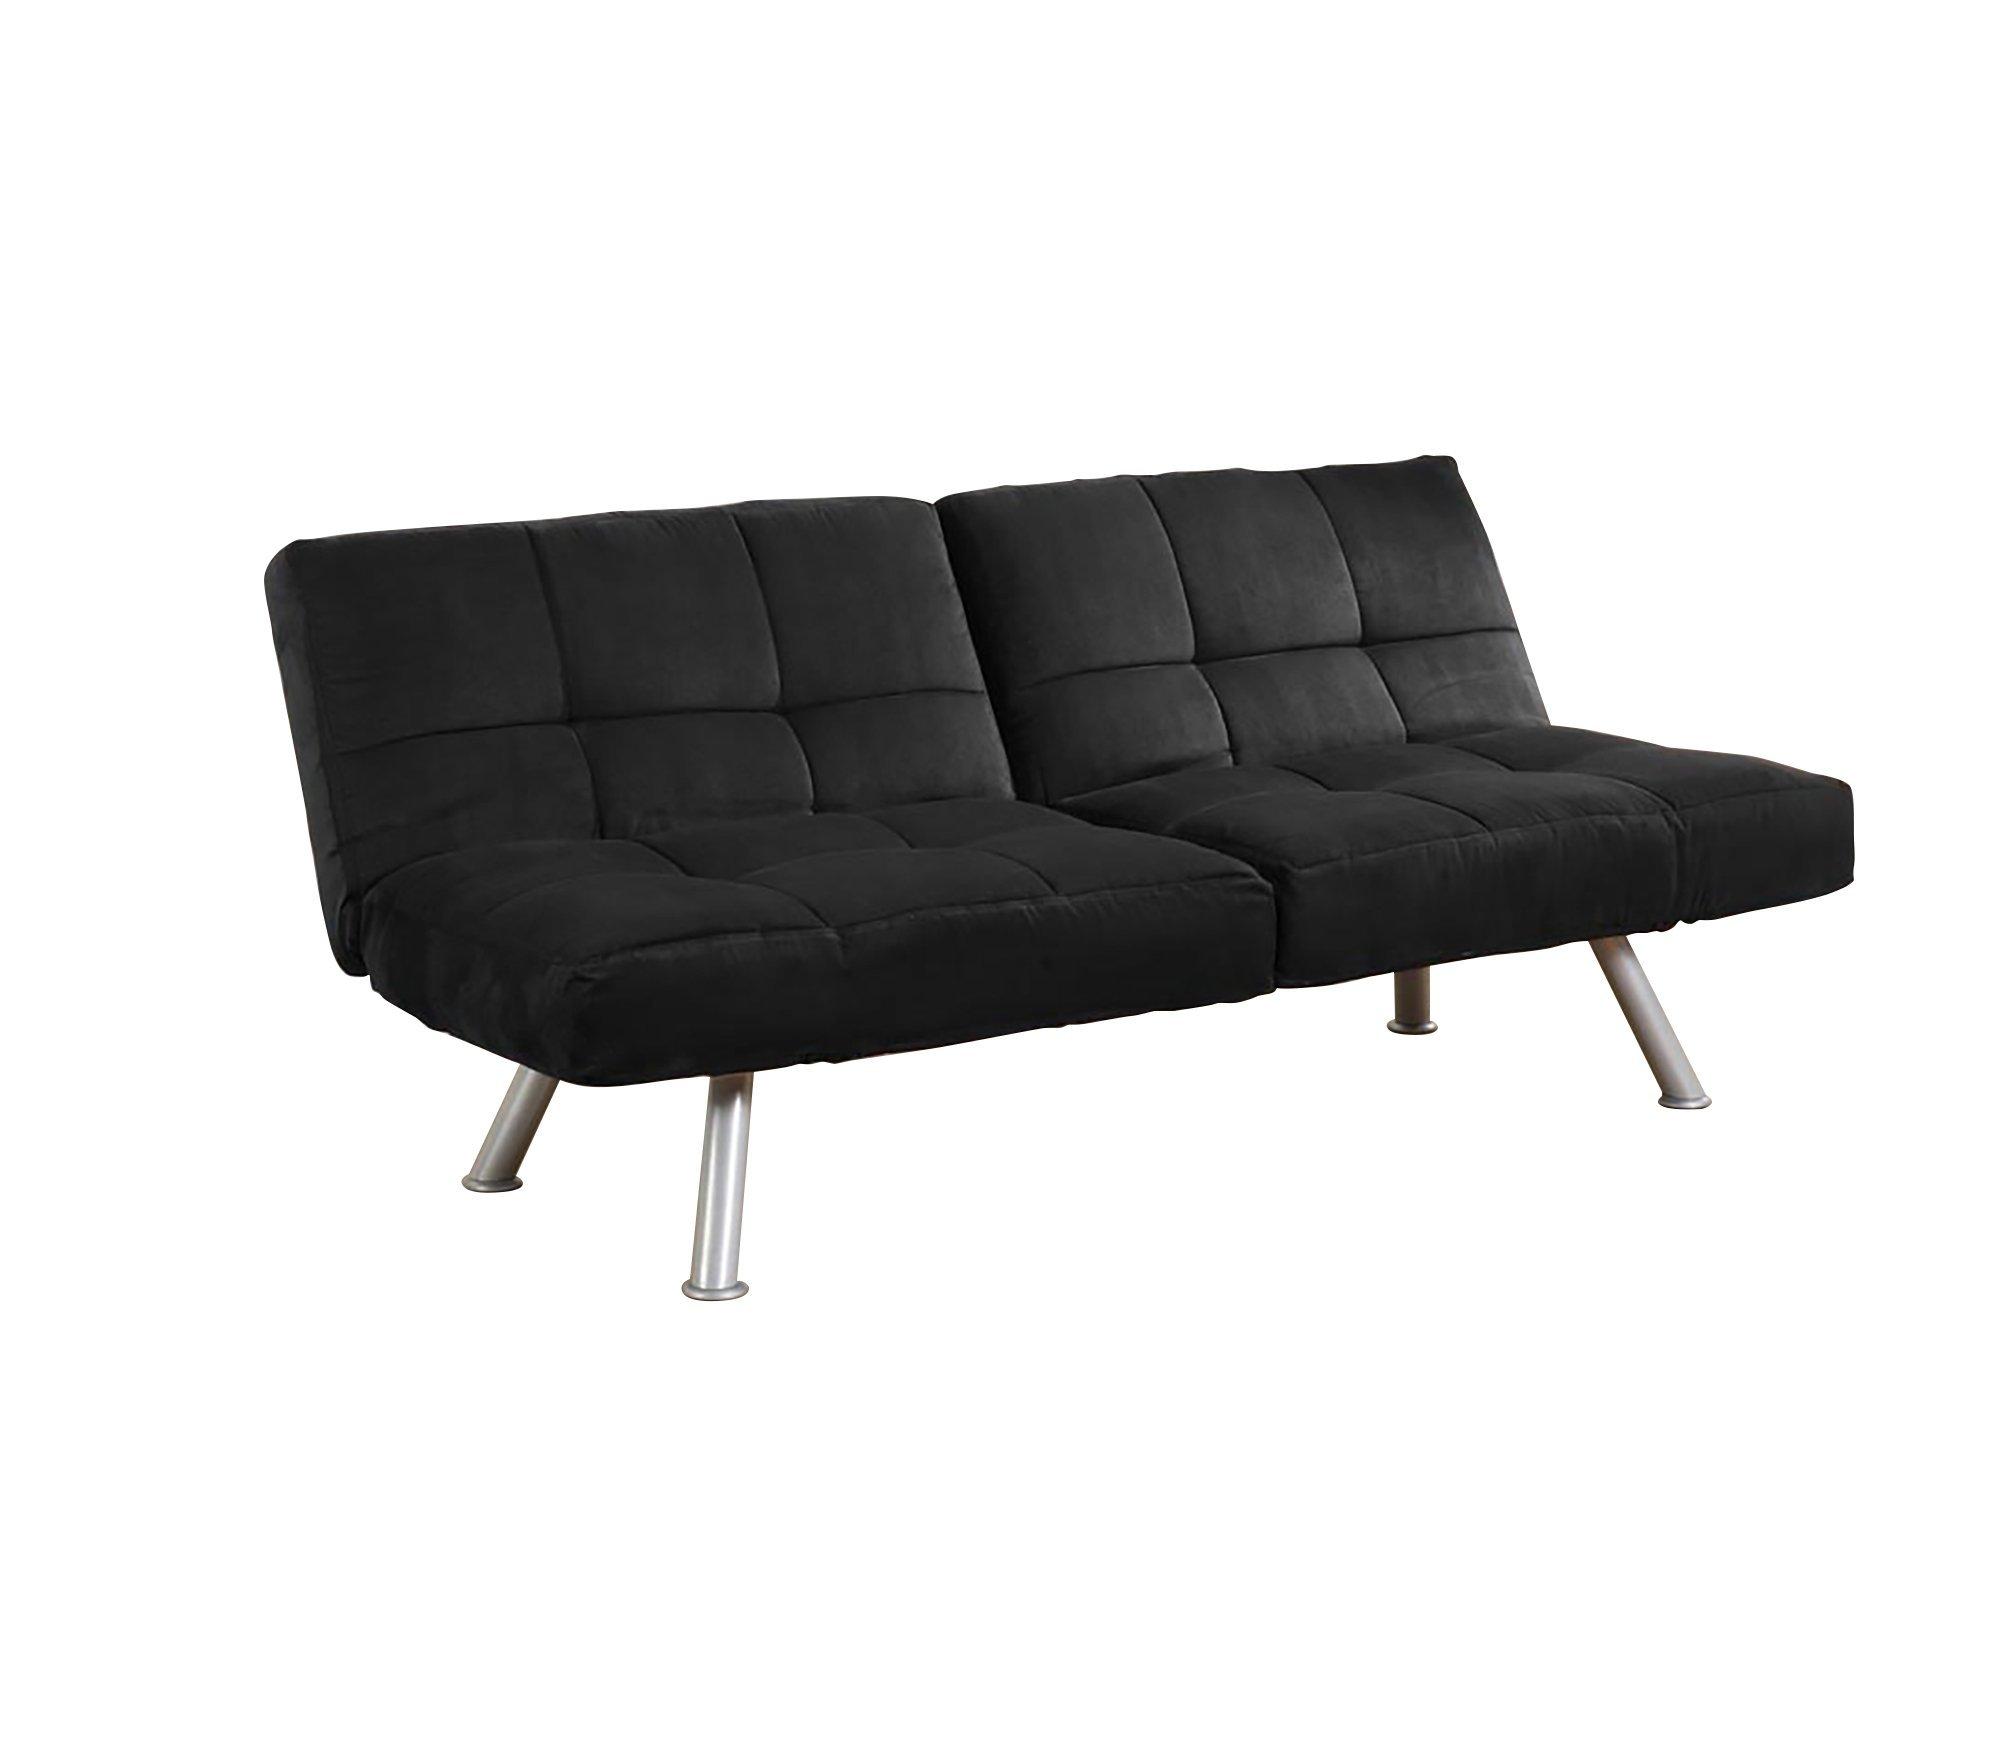 like american bk black leather sundown freight couch plush bed futon sofa